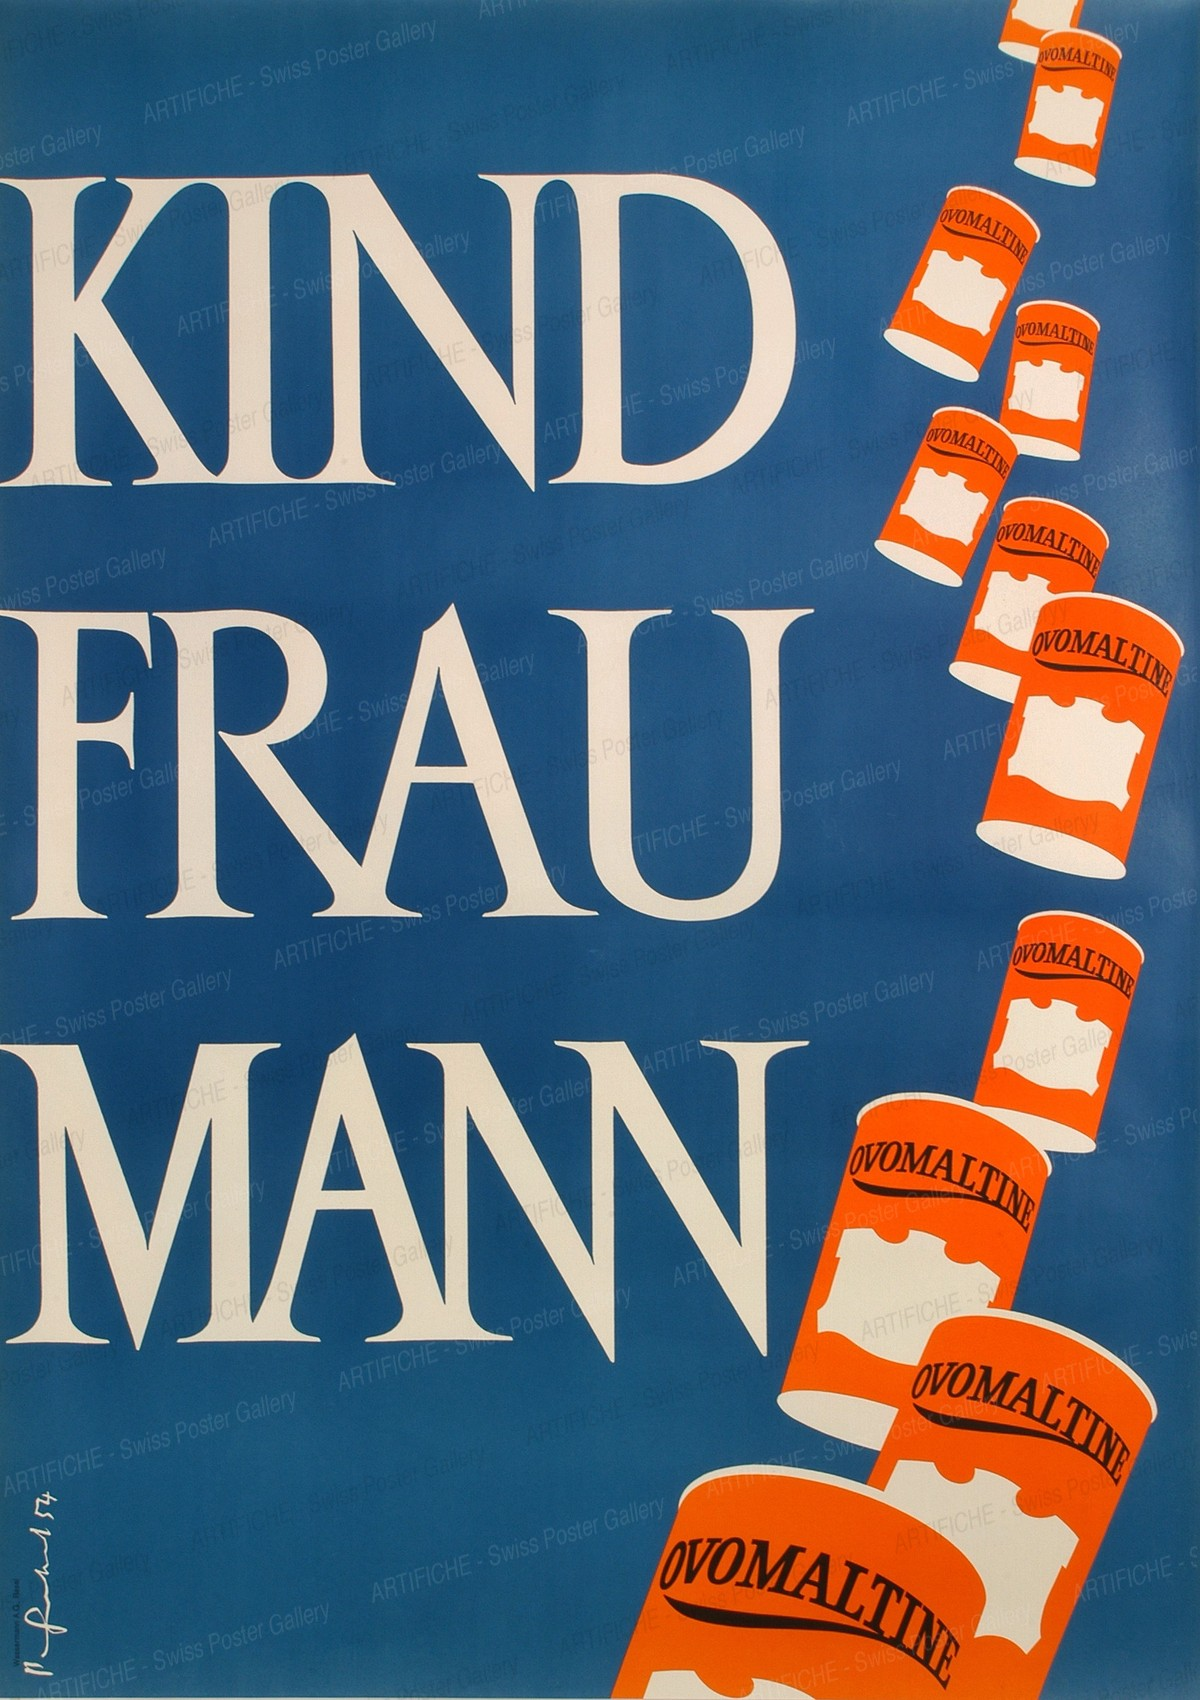 KIND FRAU MANN – Ovomaltine, Pierre Gauchat